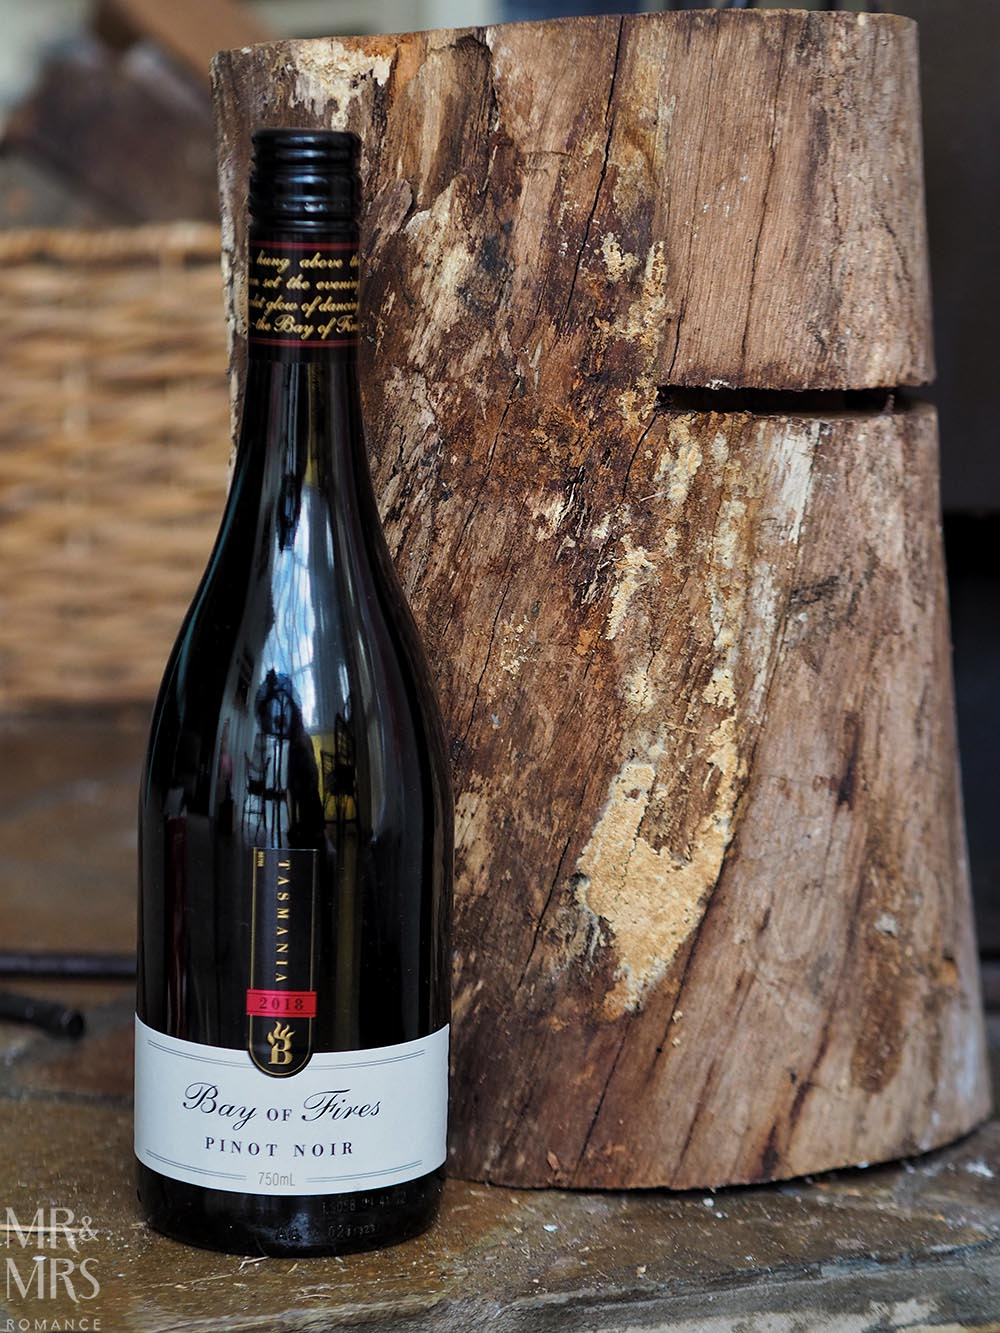 Wine tasting - Bay of Fires Pinot Noir